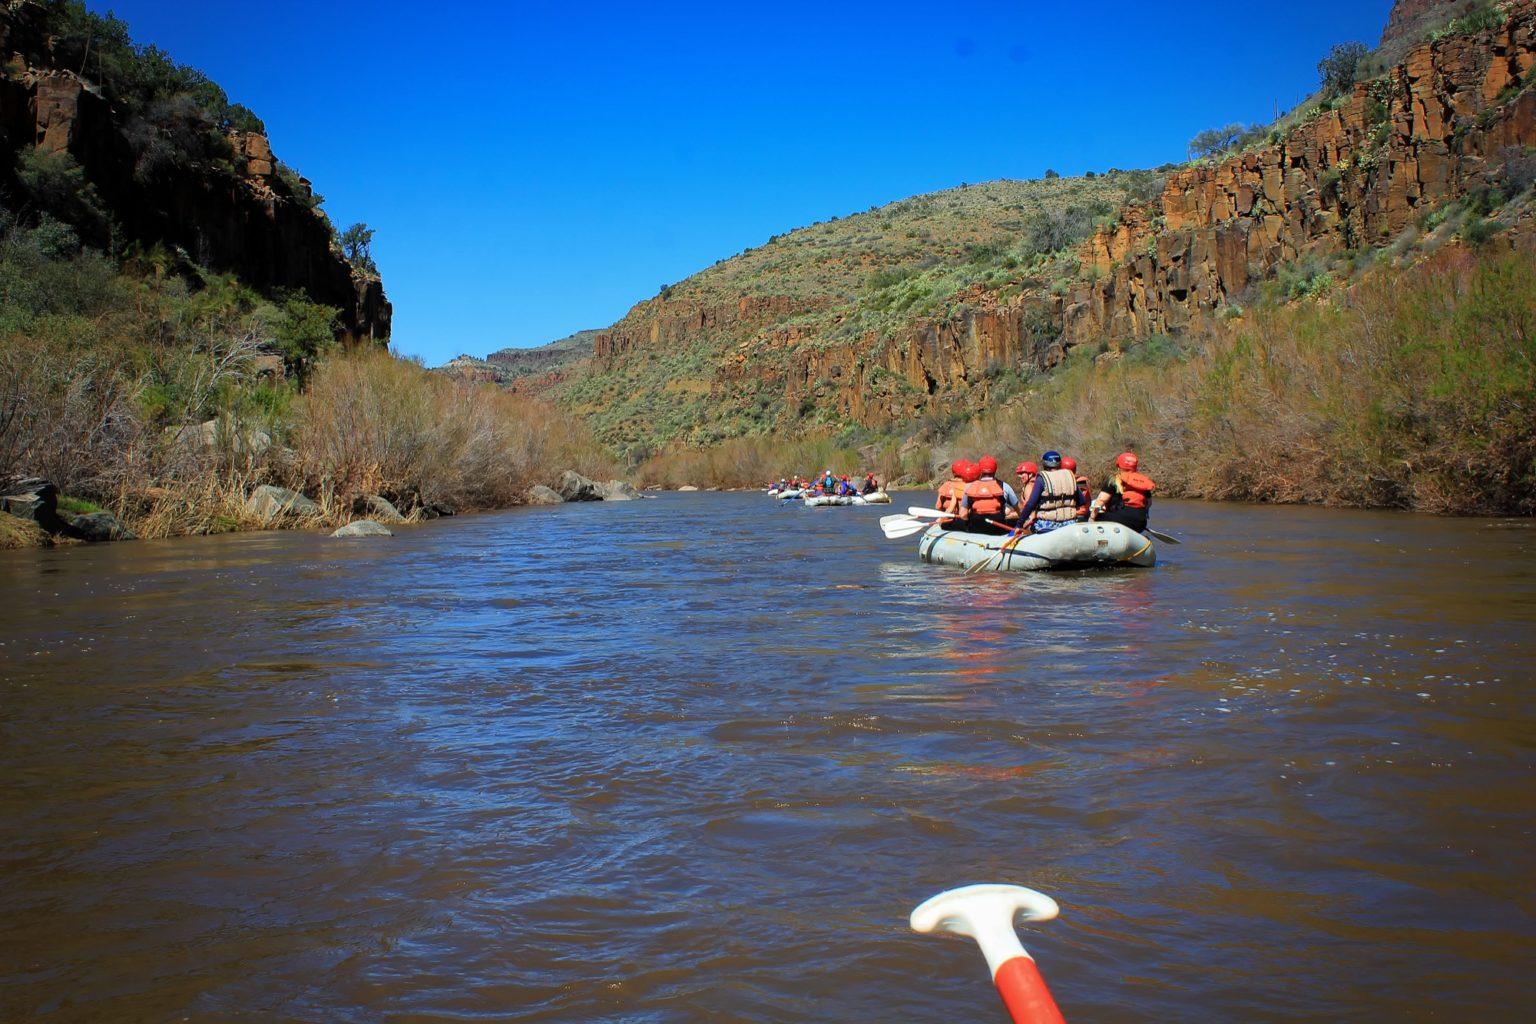 Arizona Rafting, White Water Rafting AZ, Salt and Verde Rivers